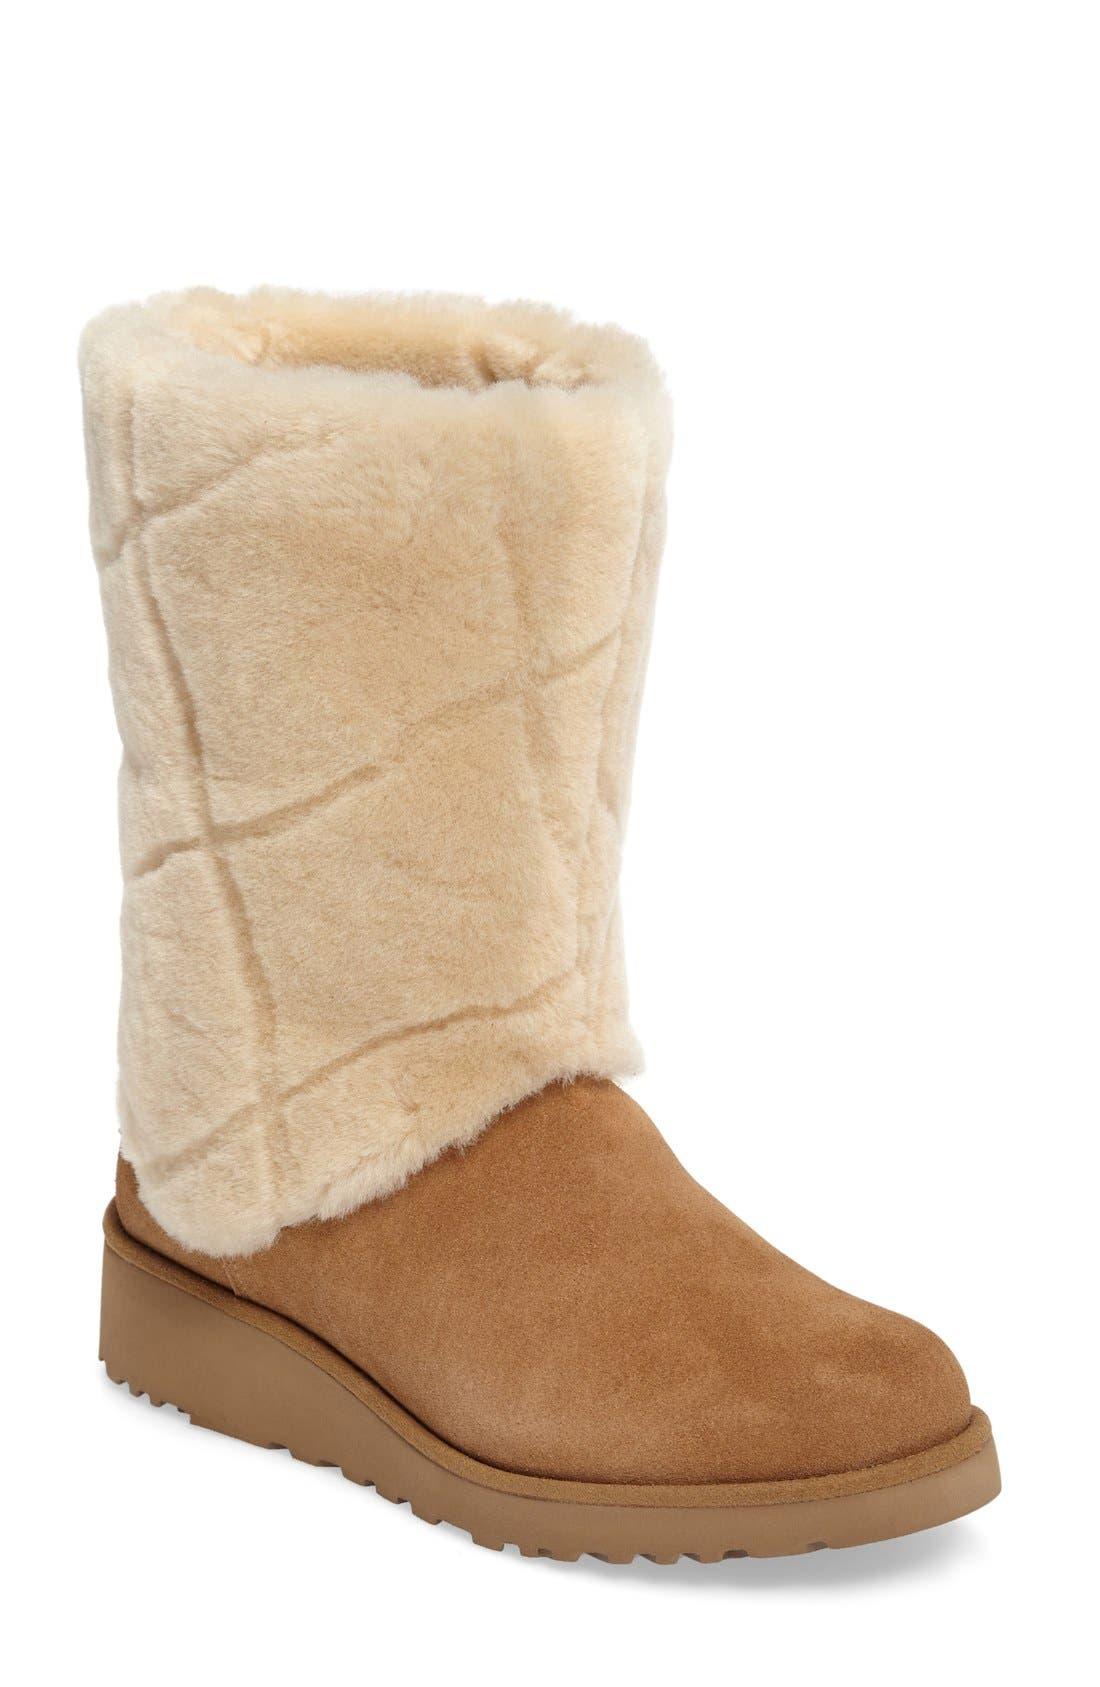 Alternate Image 1 Selected - UGG® Ariella Luxe Diamond Genuine Shearling Boot (Women)